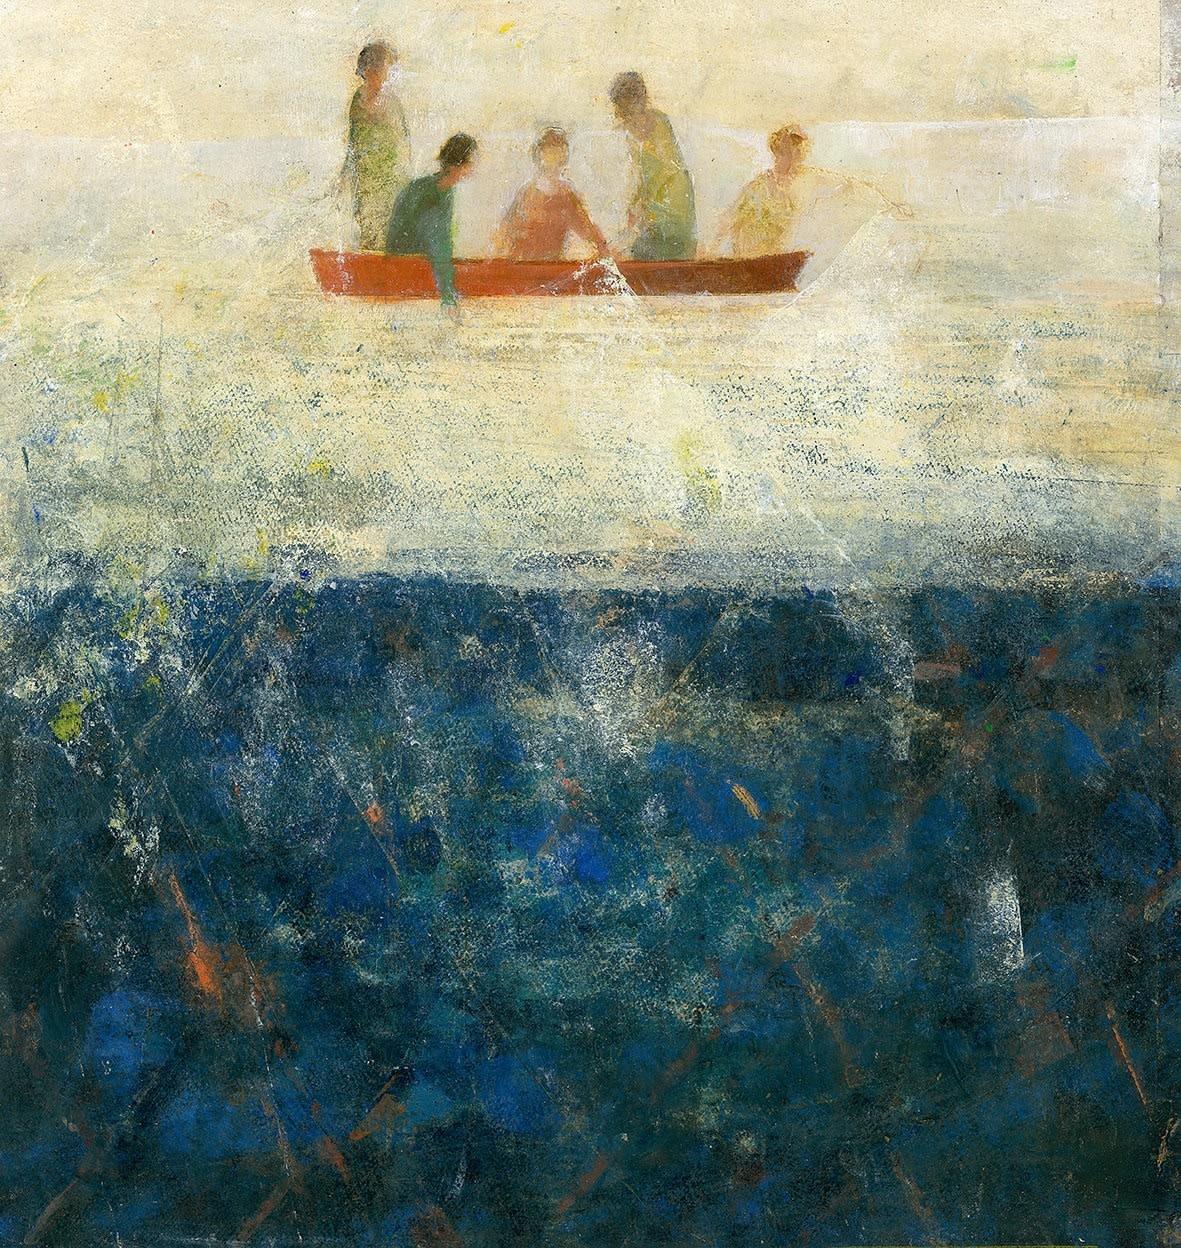 "<span class=""link fancybox-details-link""><a href=""/artists/47-david-brayne/works/12024-david-brayne-the-sea-carries-the-net/"">View Detail Page</a></span><div class=""artist""><span class=""artist""><strong>David Brayne</strong></span></div><div class=""title""><em>The Sea Carries the Net</em></div><div class=""medium"">Frame: 67 x 64 cm<br /> Artwork: 53 x 50 cm</div><div class=""dimensions"">pigment & acrylic</div><div class=""price"">£2,300.00</div>"